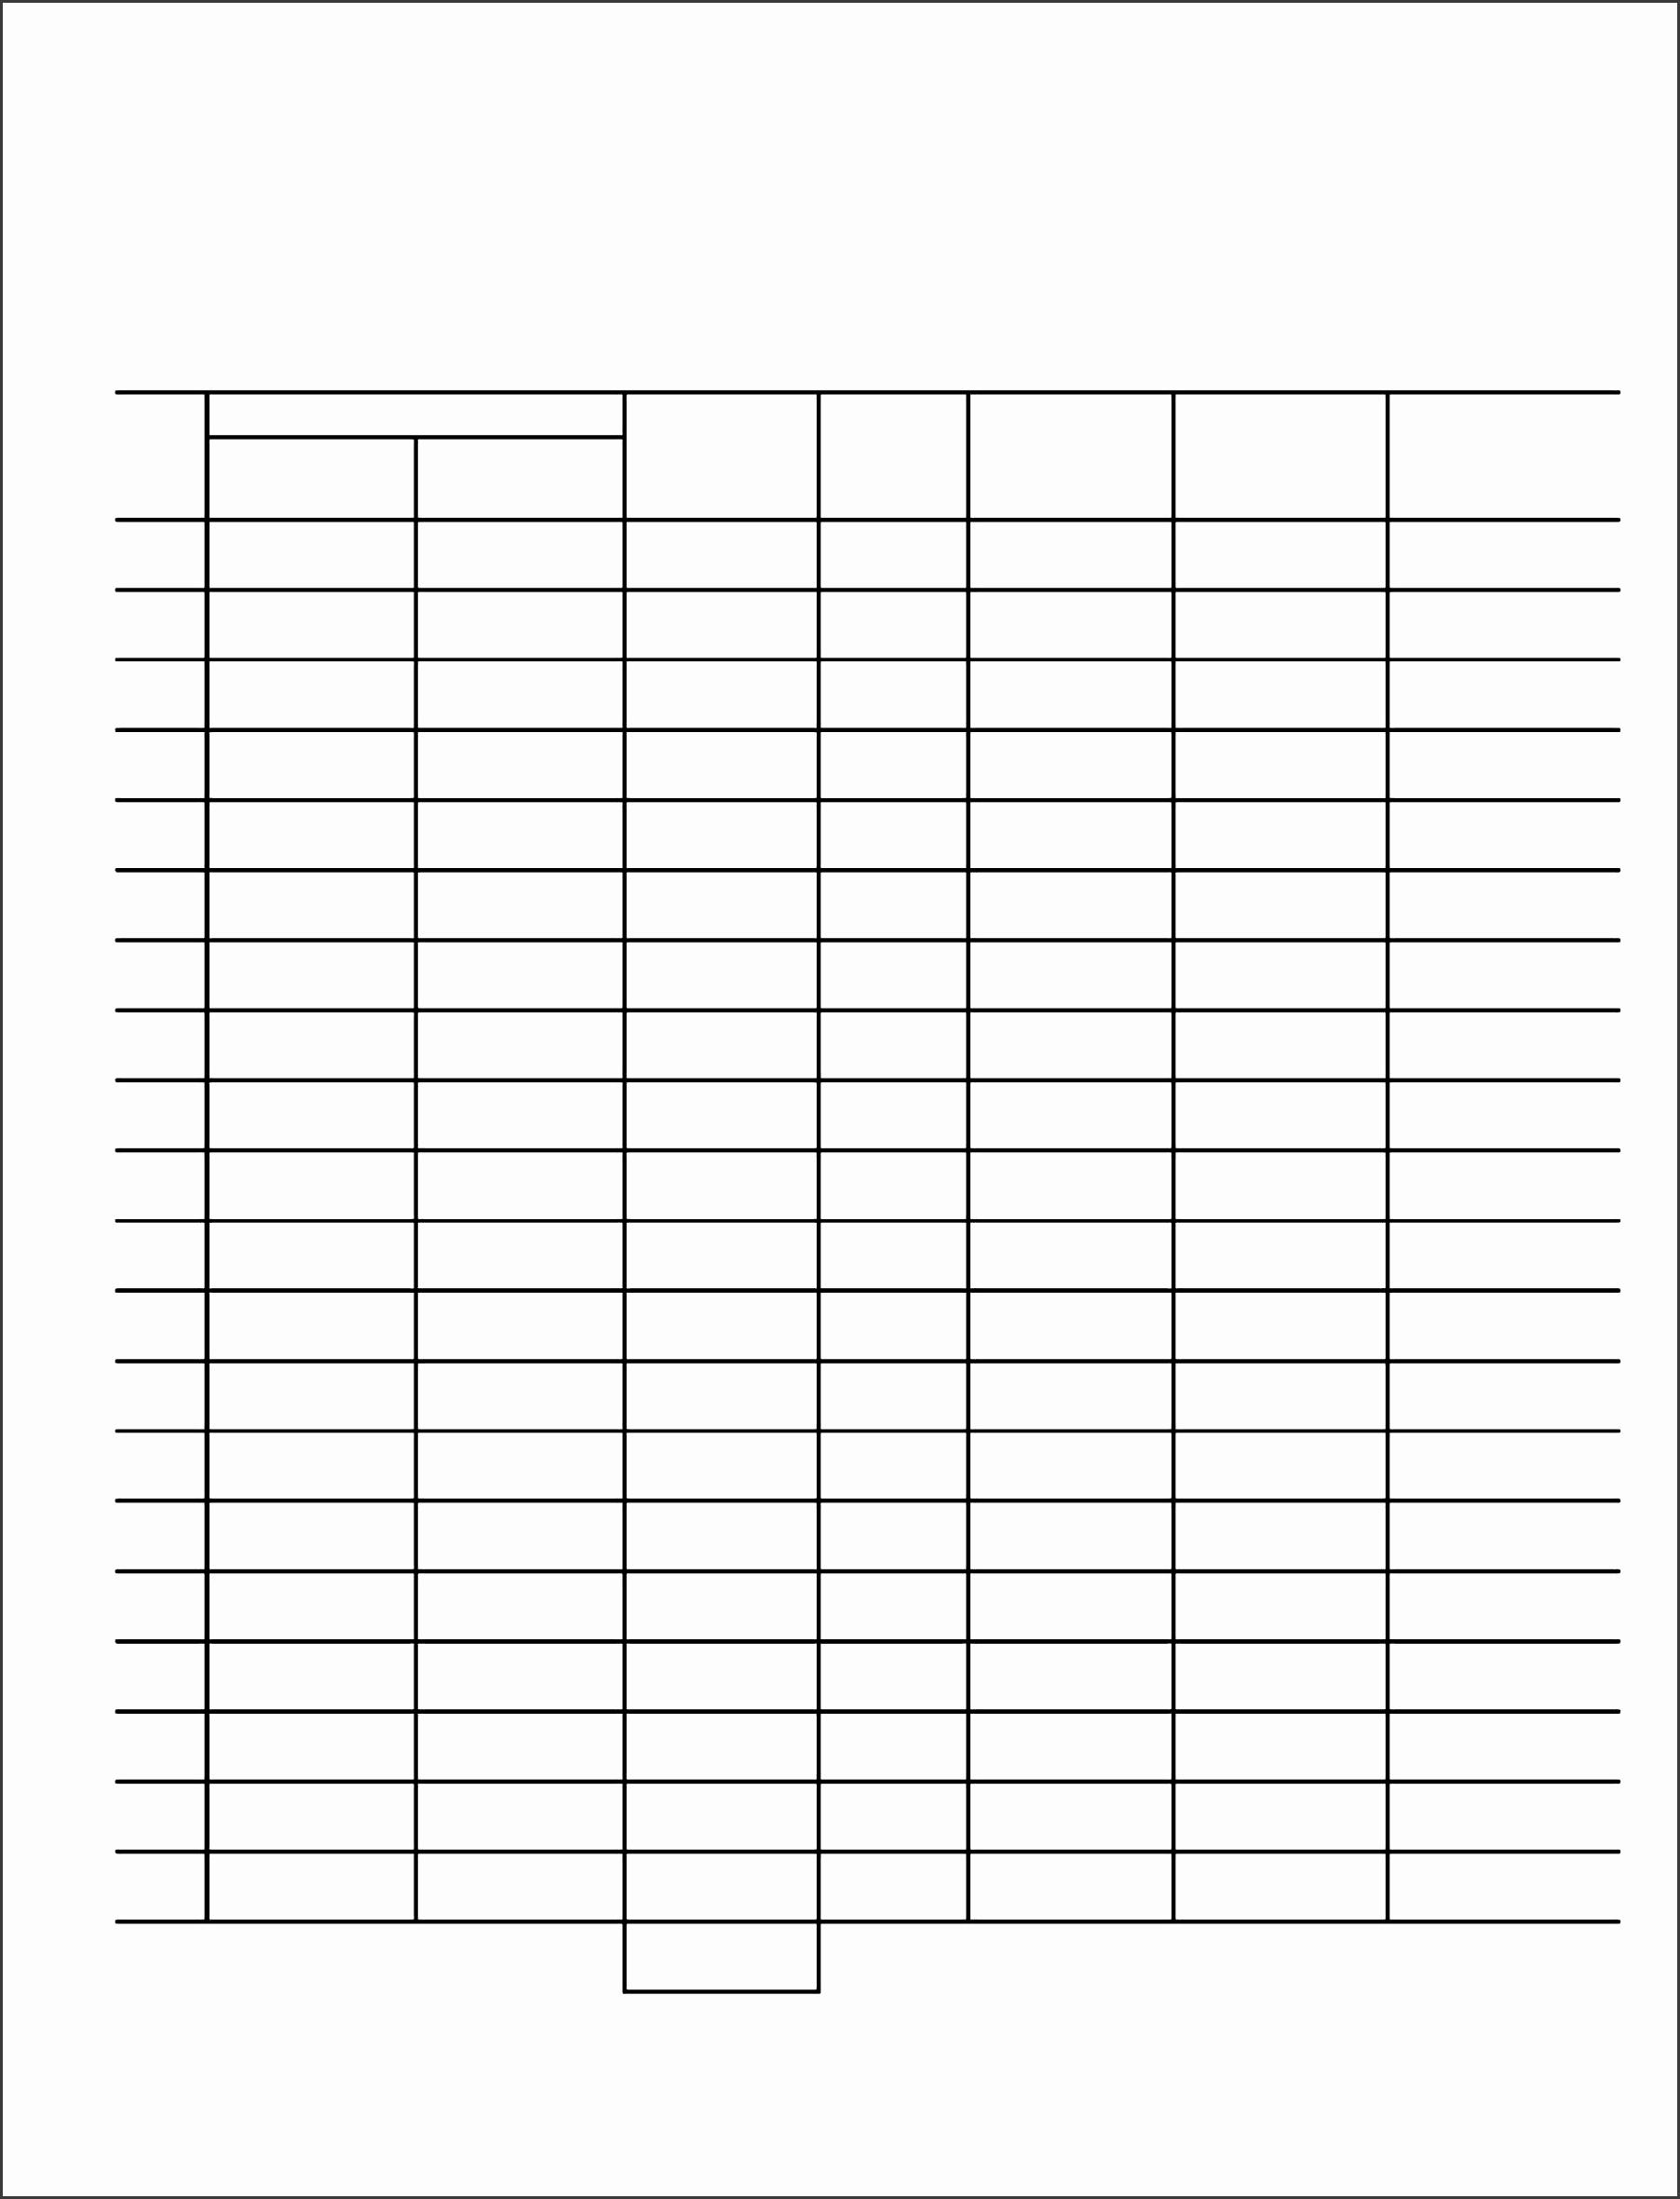 mileage log form log template memo templates sheet teknoswitch mileage mileage log form sheet teknoswitch driving